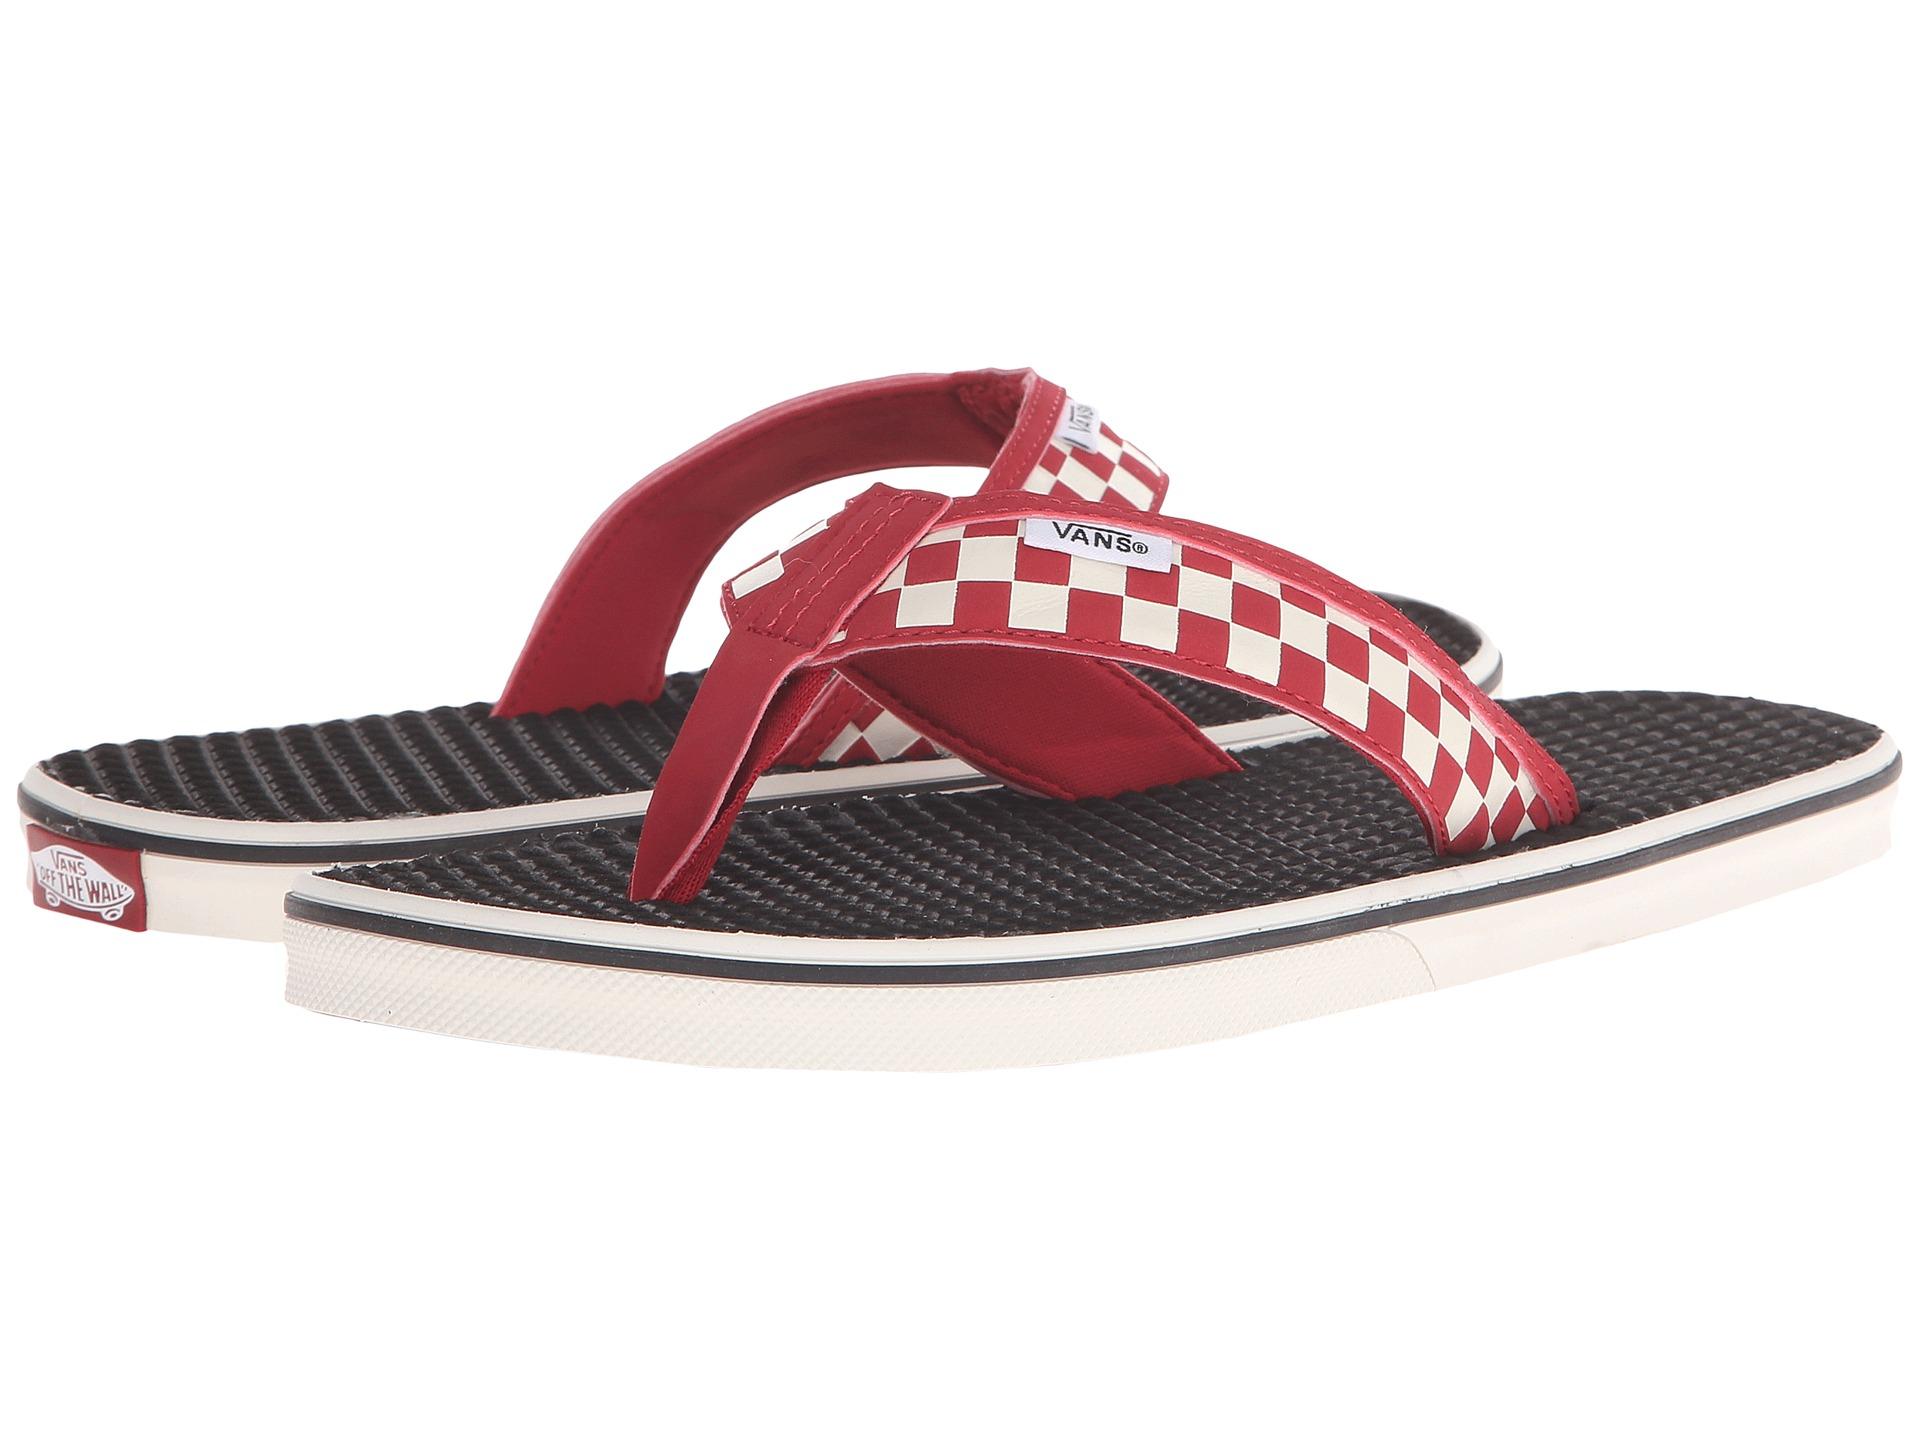 b39f54062a3cbf Lyst - Vans La Costa in Red for Men